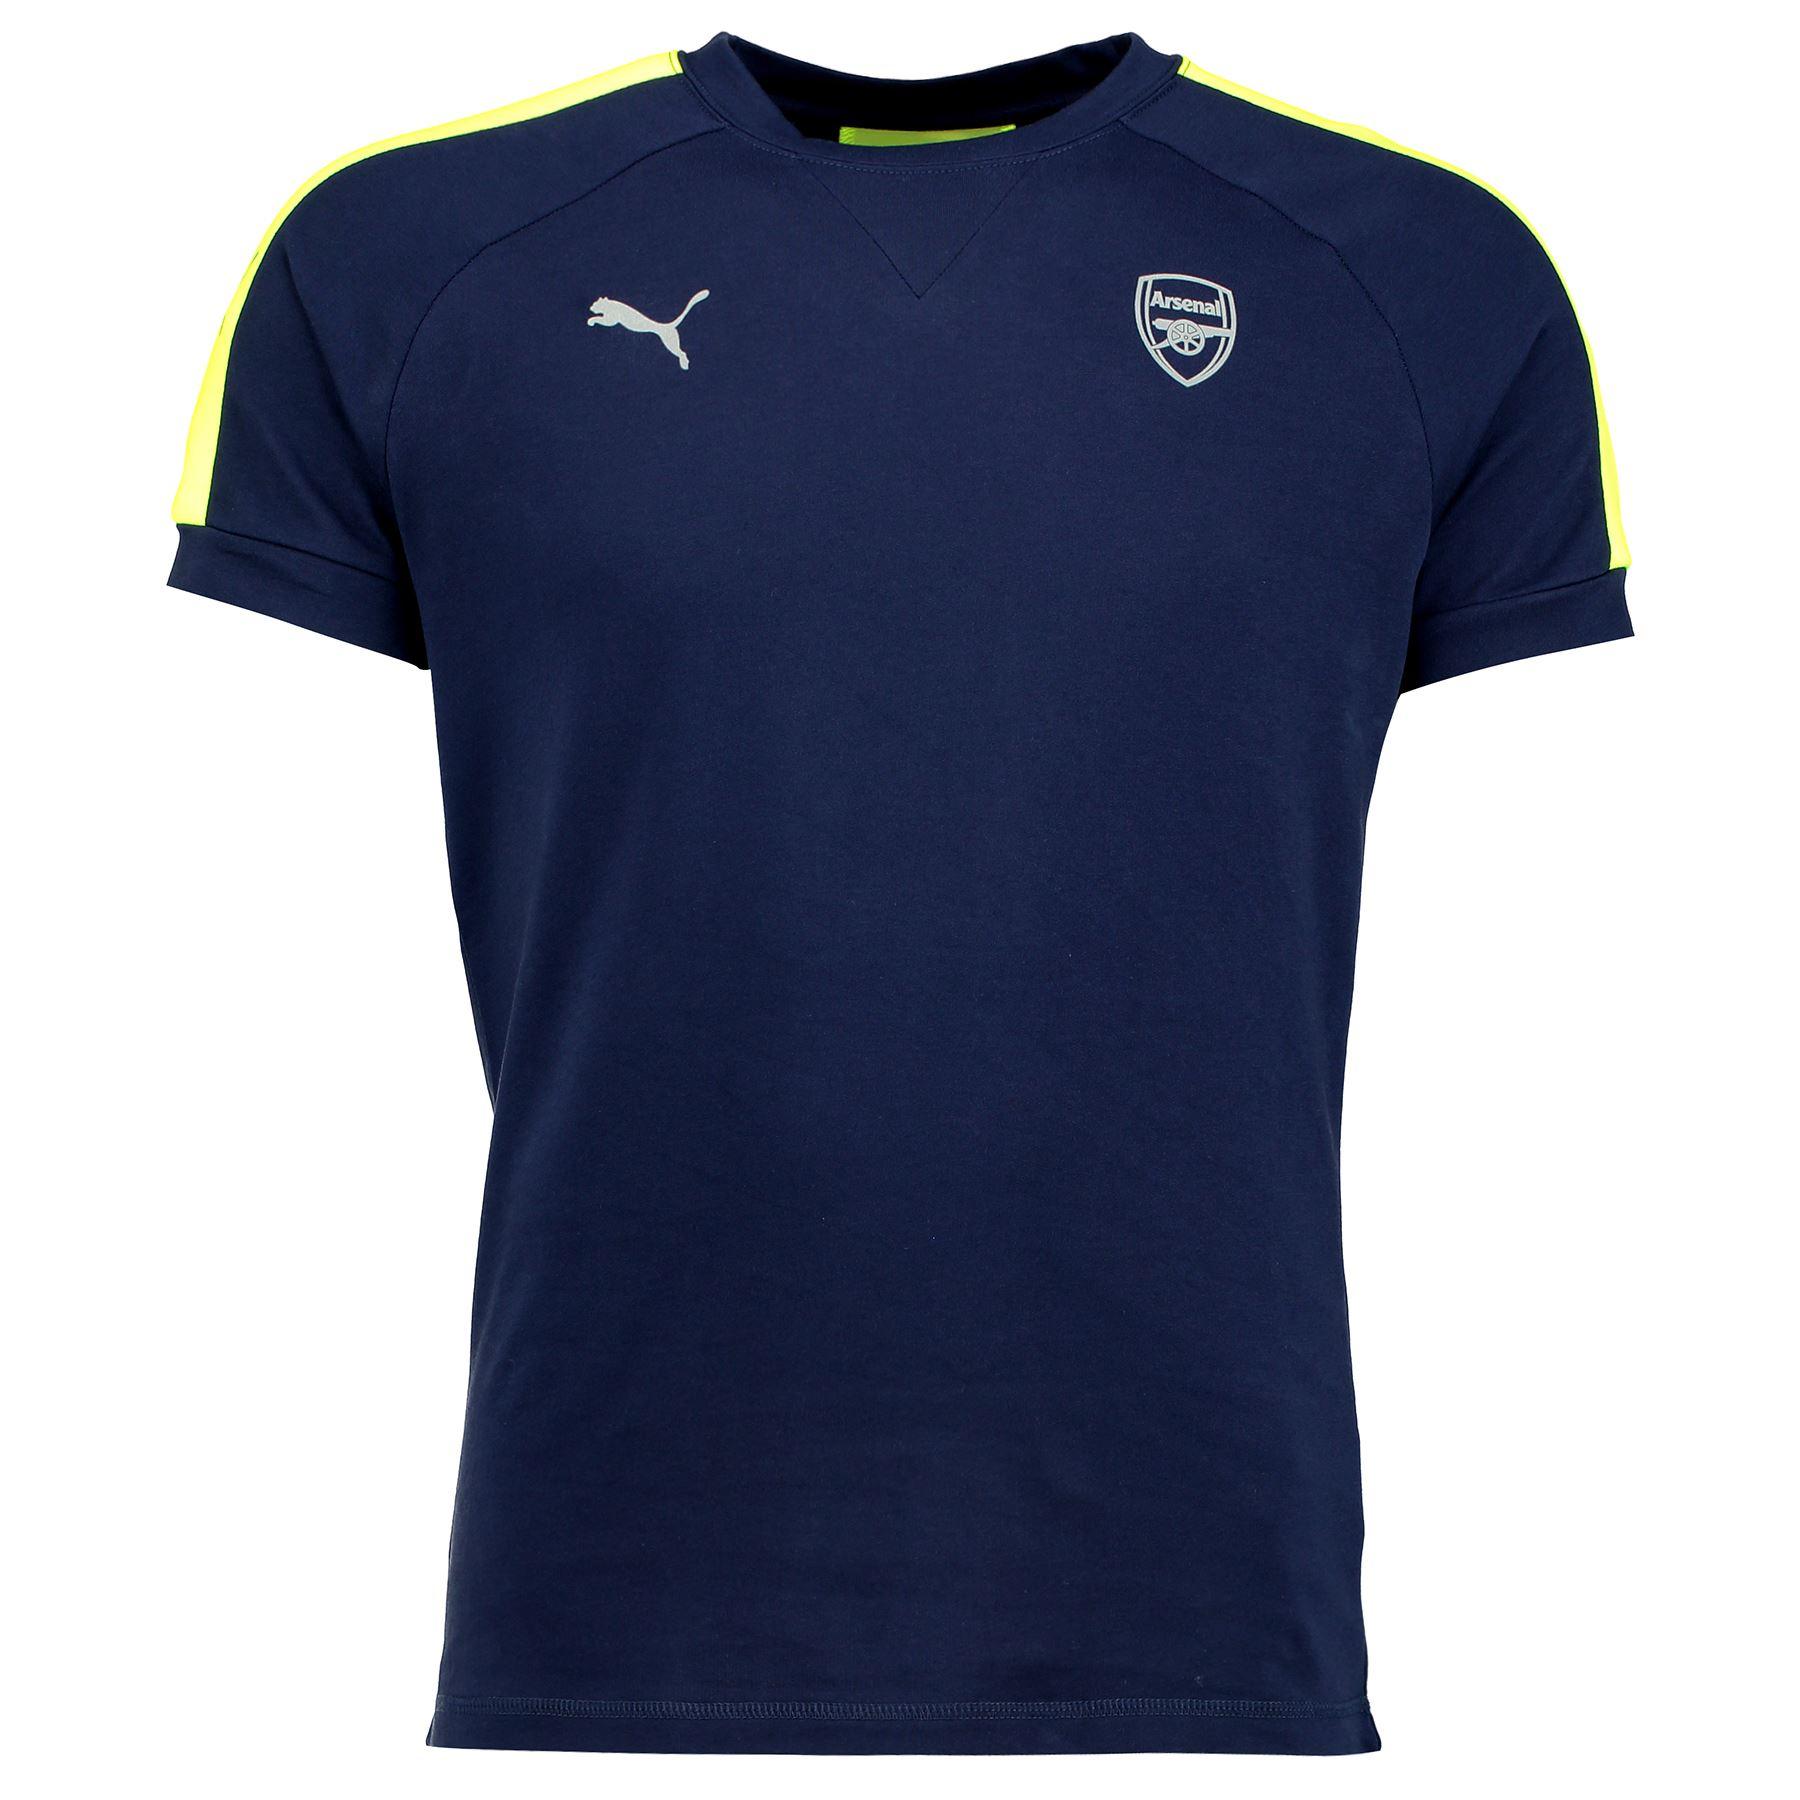 PUMA Mens Soccer Goalkeeper Jersey Shirt -70018102 | eBay |Cool Puma Soccer Shirts